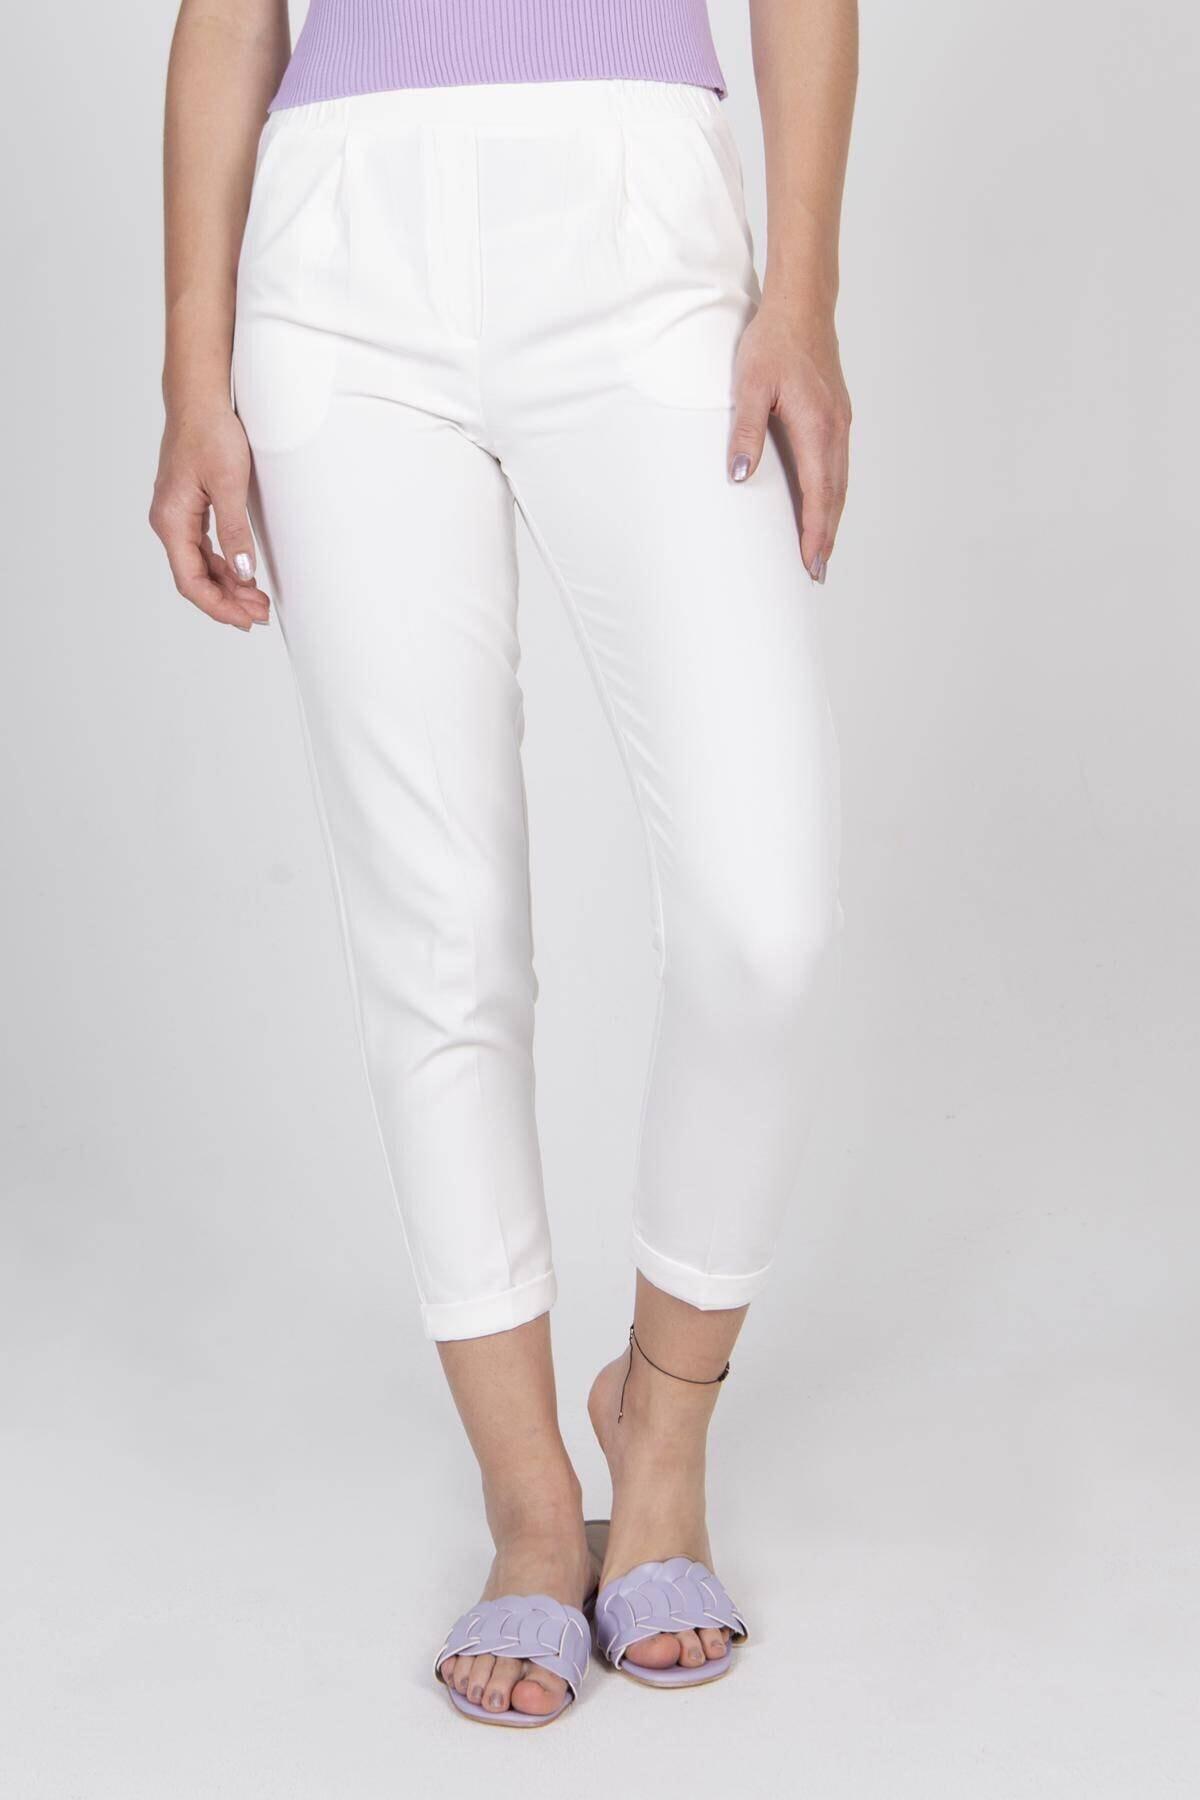 Addax Kadın Beyaz Belmando Pantolon Pn4508 - A4 Adx-00007146 1